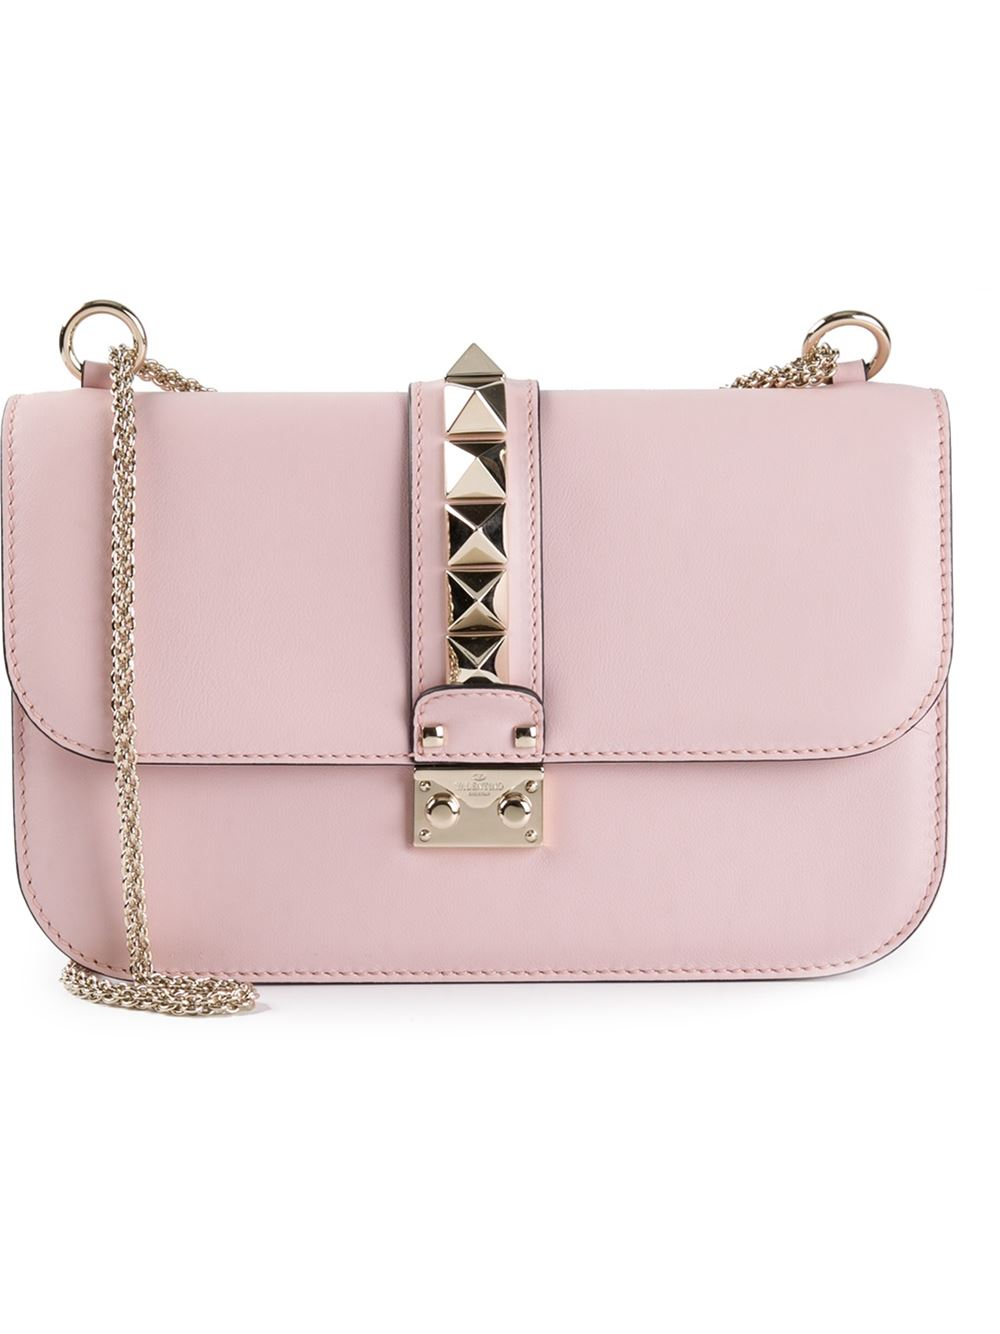 valentino glam lock shoulder bag in pink lyst